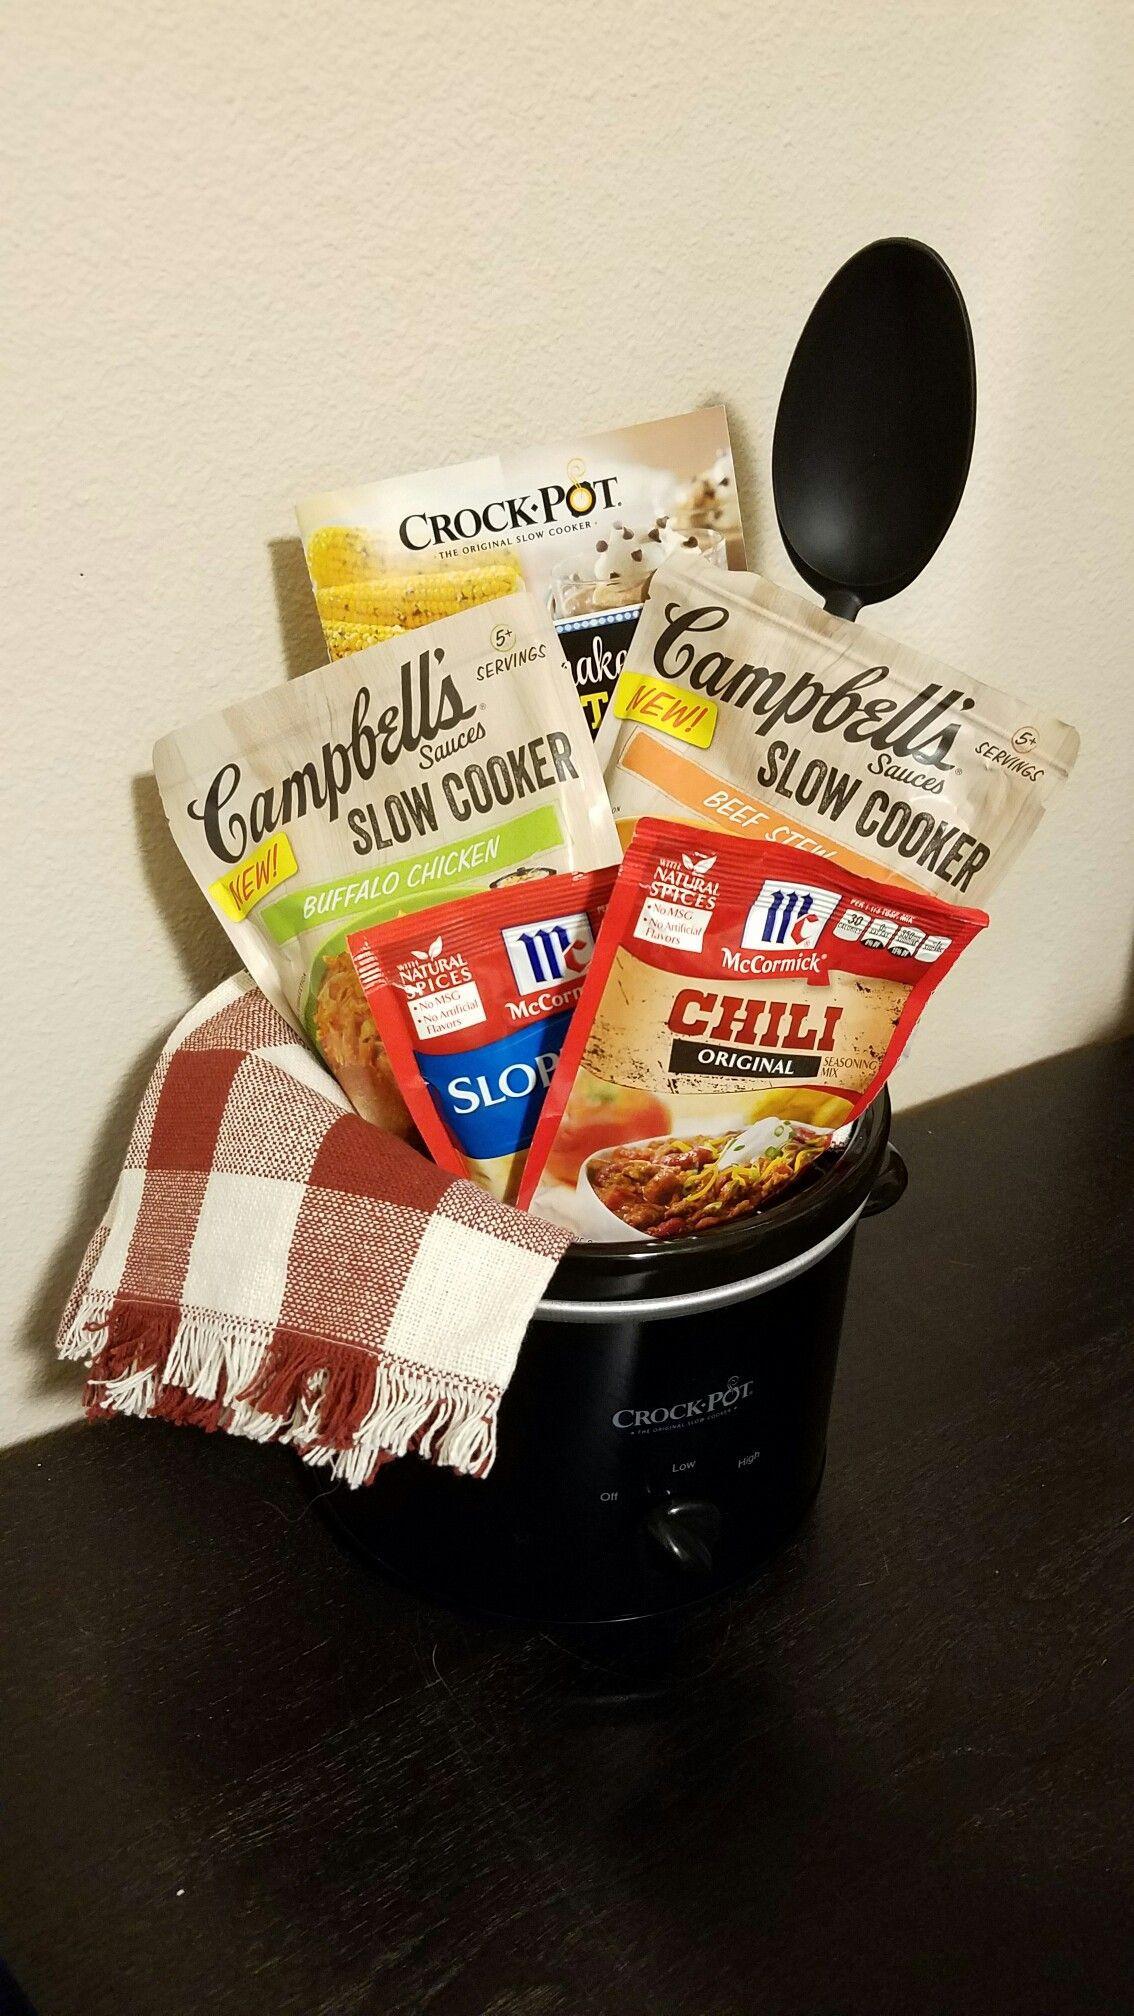 Crock Pot Gift Basket Ideas  Crockpot kitchen Dinner Gift Basket Silent auction